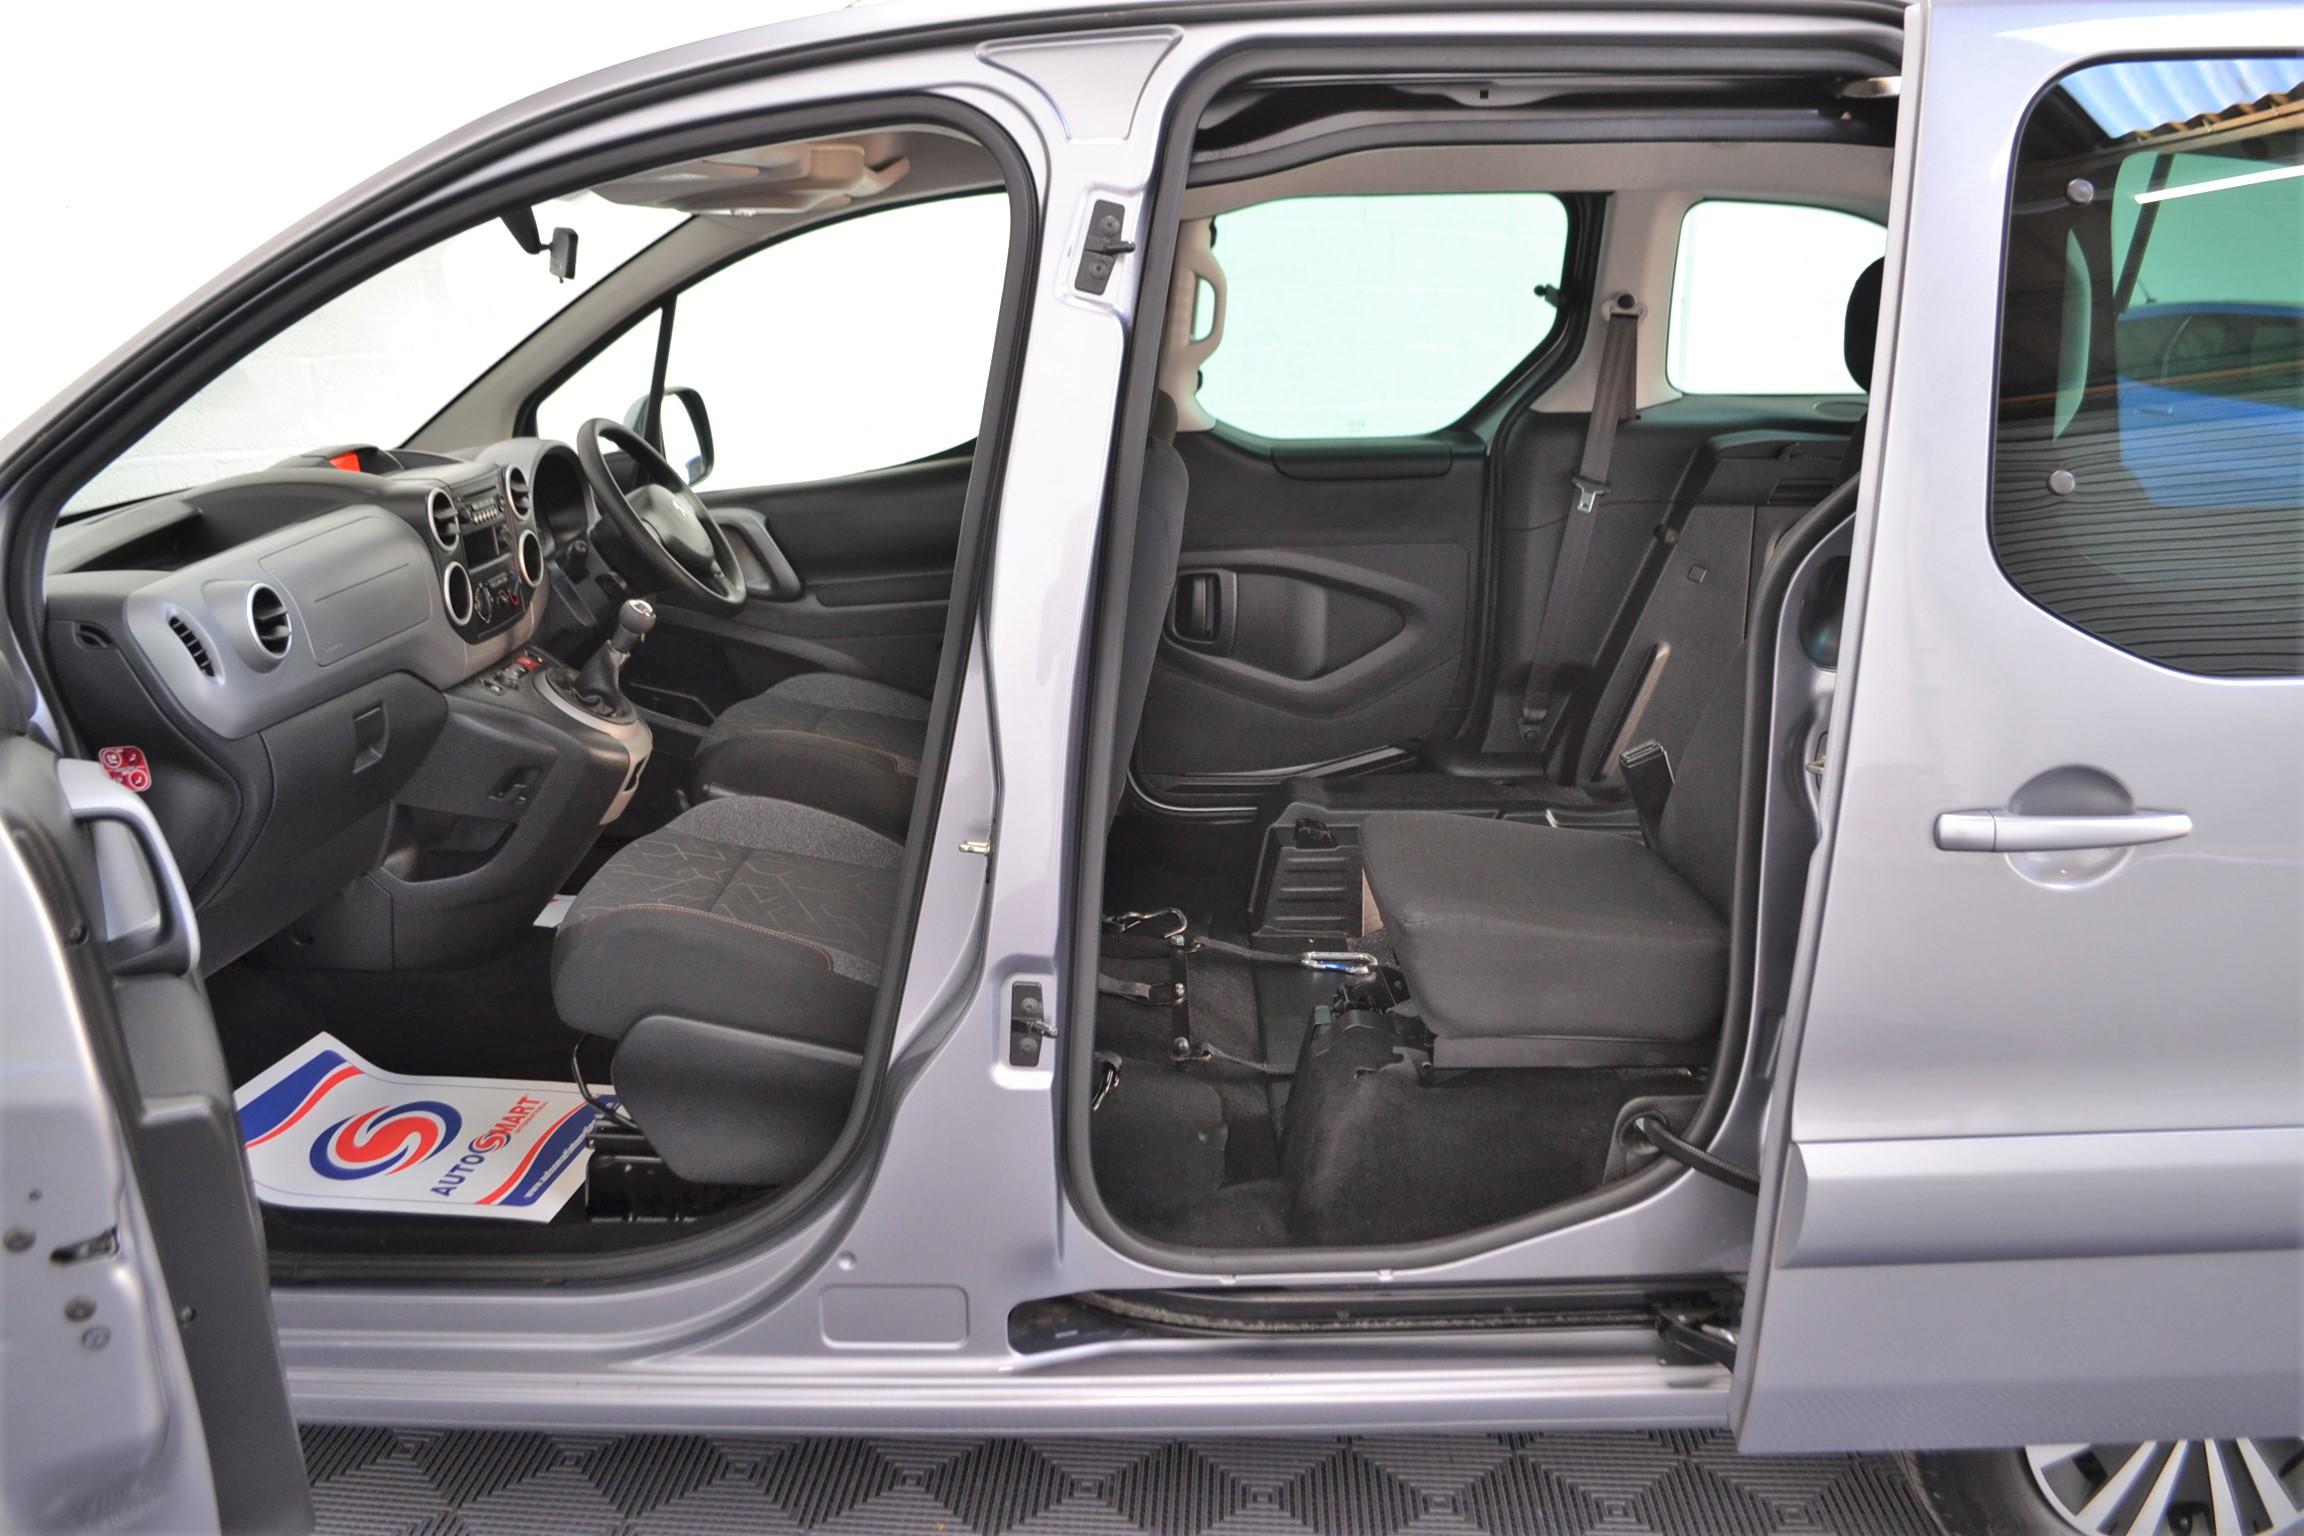 WAV Cars For Sale Bristol Wheelchair Accessible Vehicles Used For Sale Somerset Devon Dorset Bath Peugeot Partner SD17 OZL 13